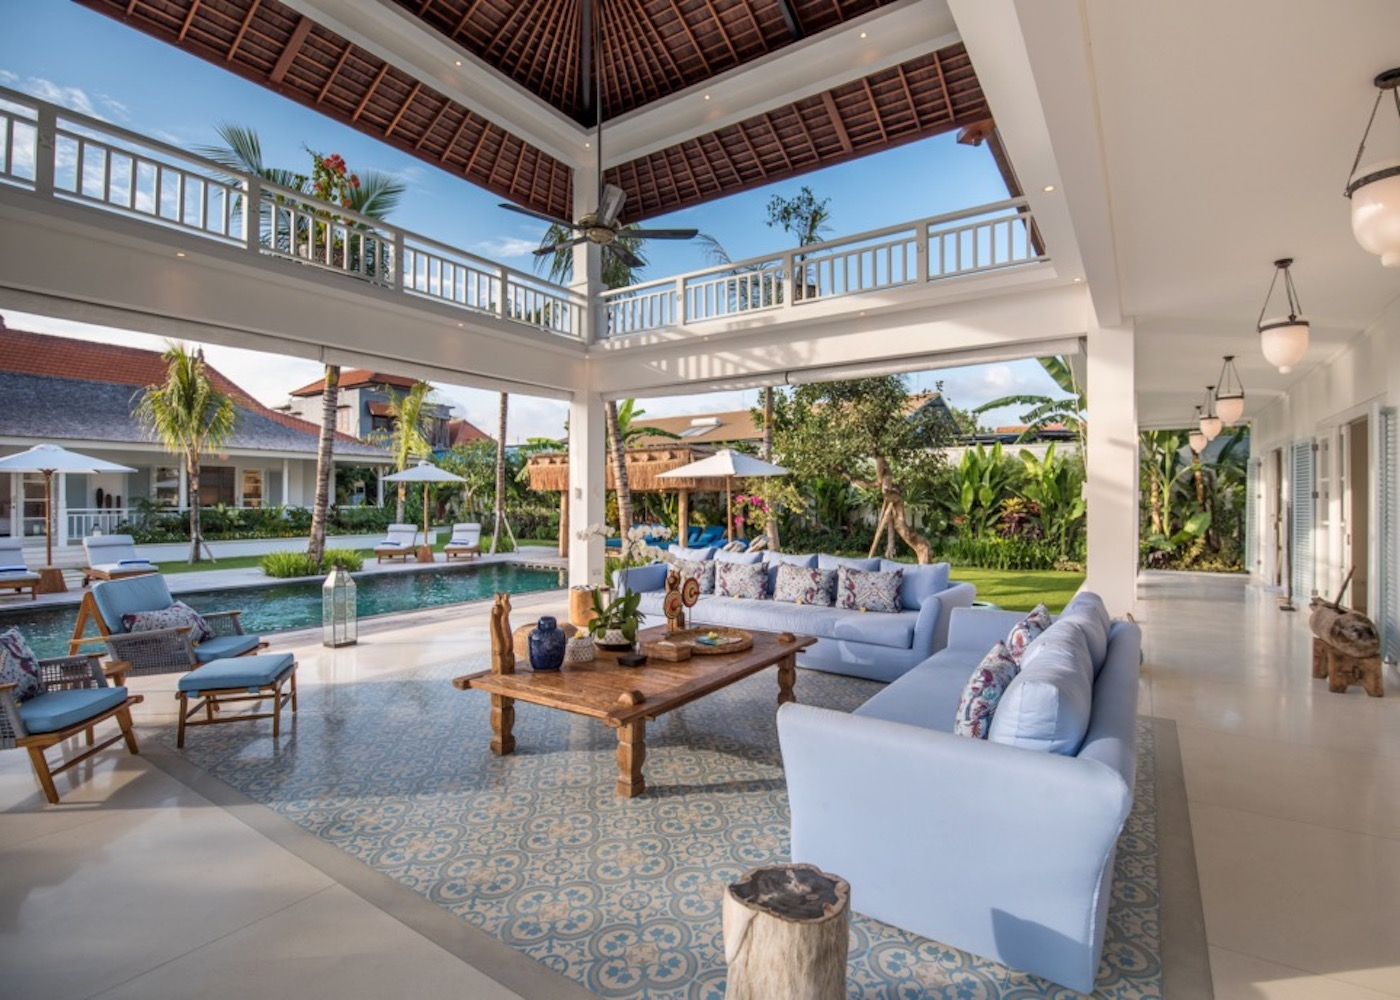 Villa Marang in Canggu - the best family-friendly villas in Bali, Indonesia